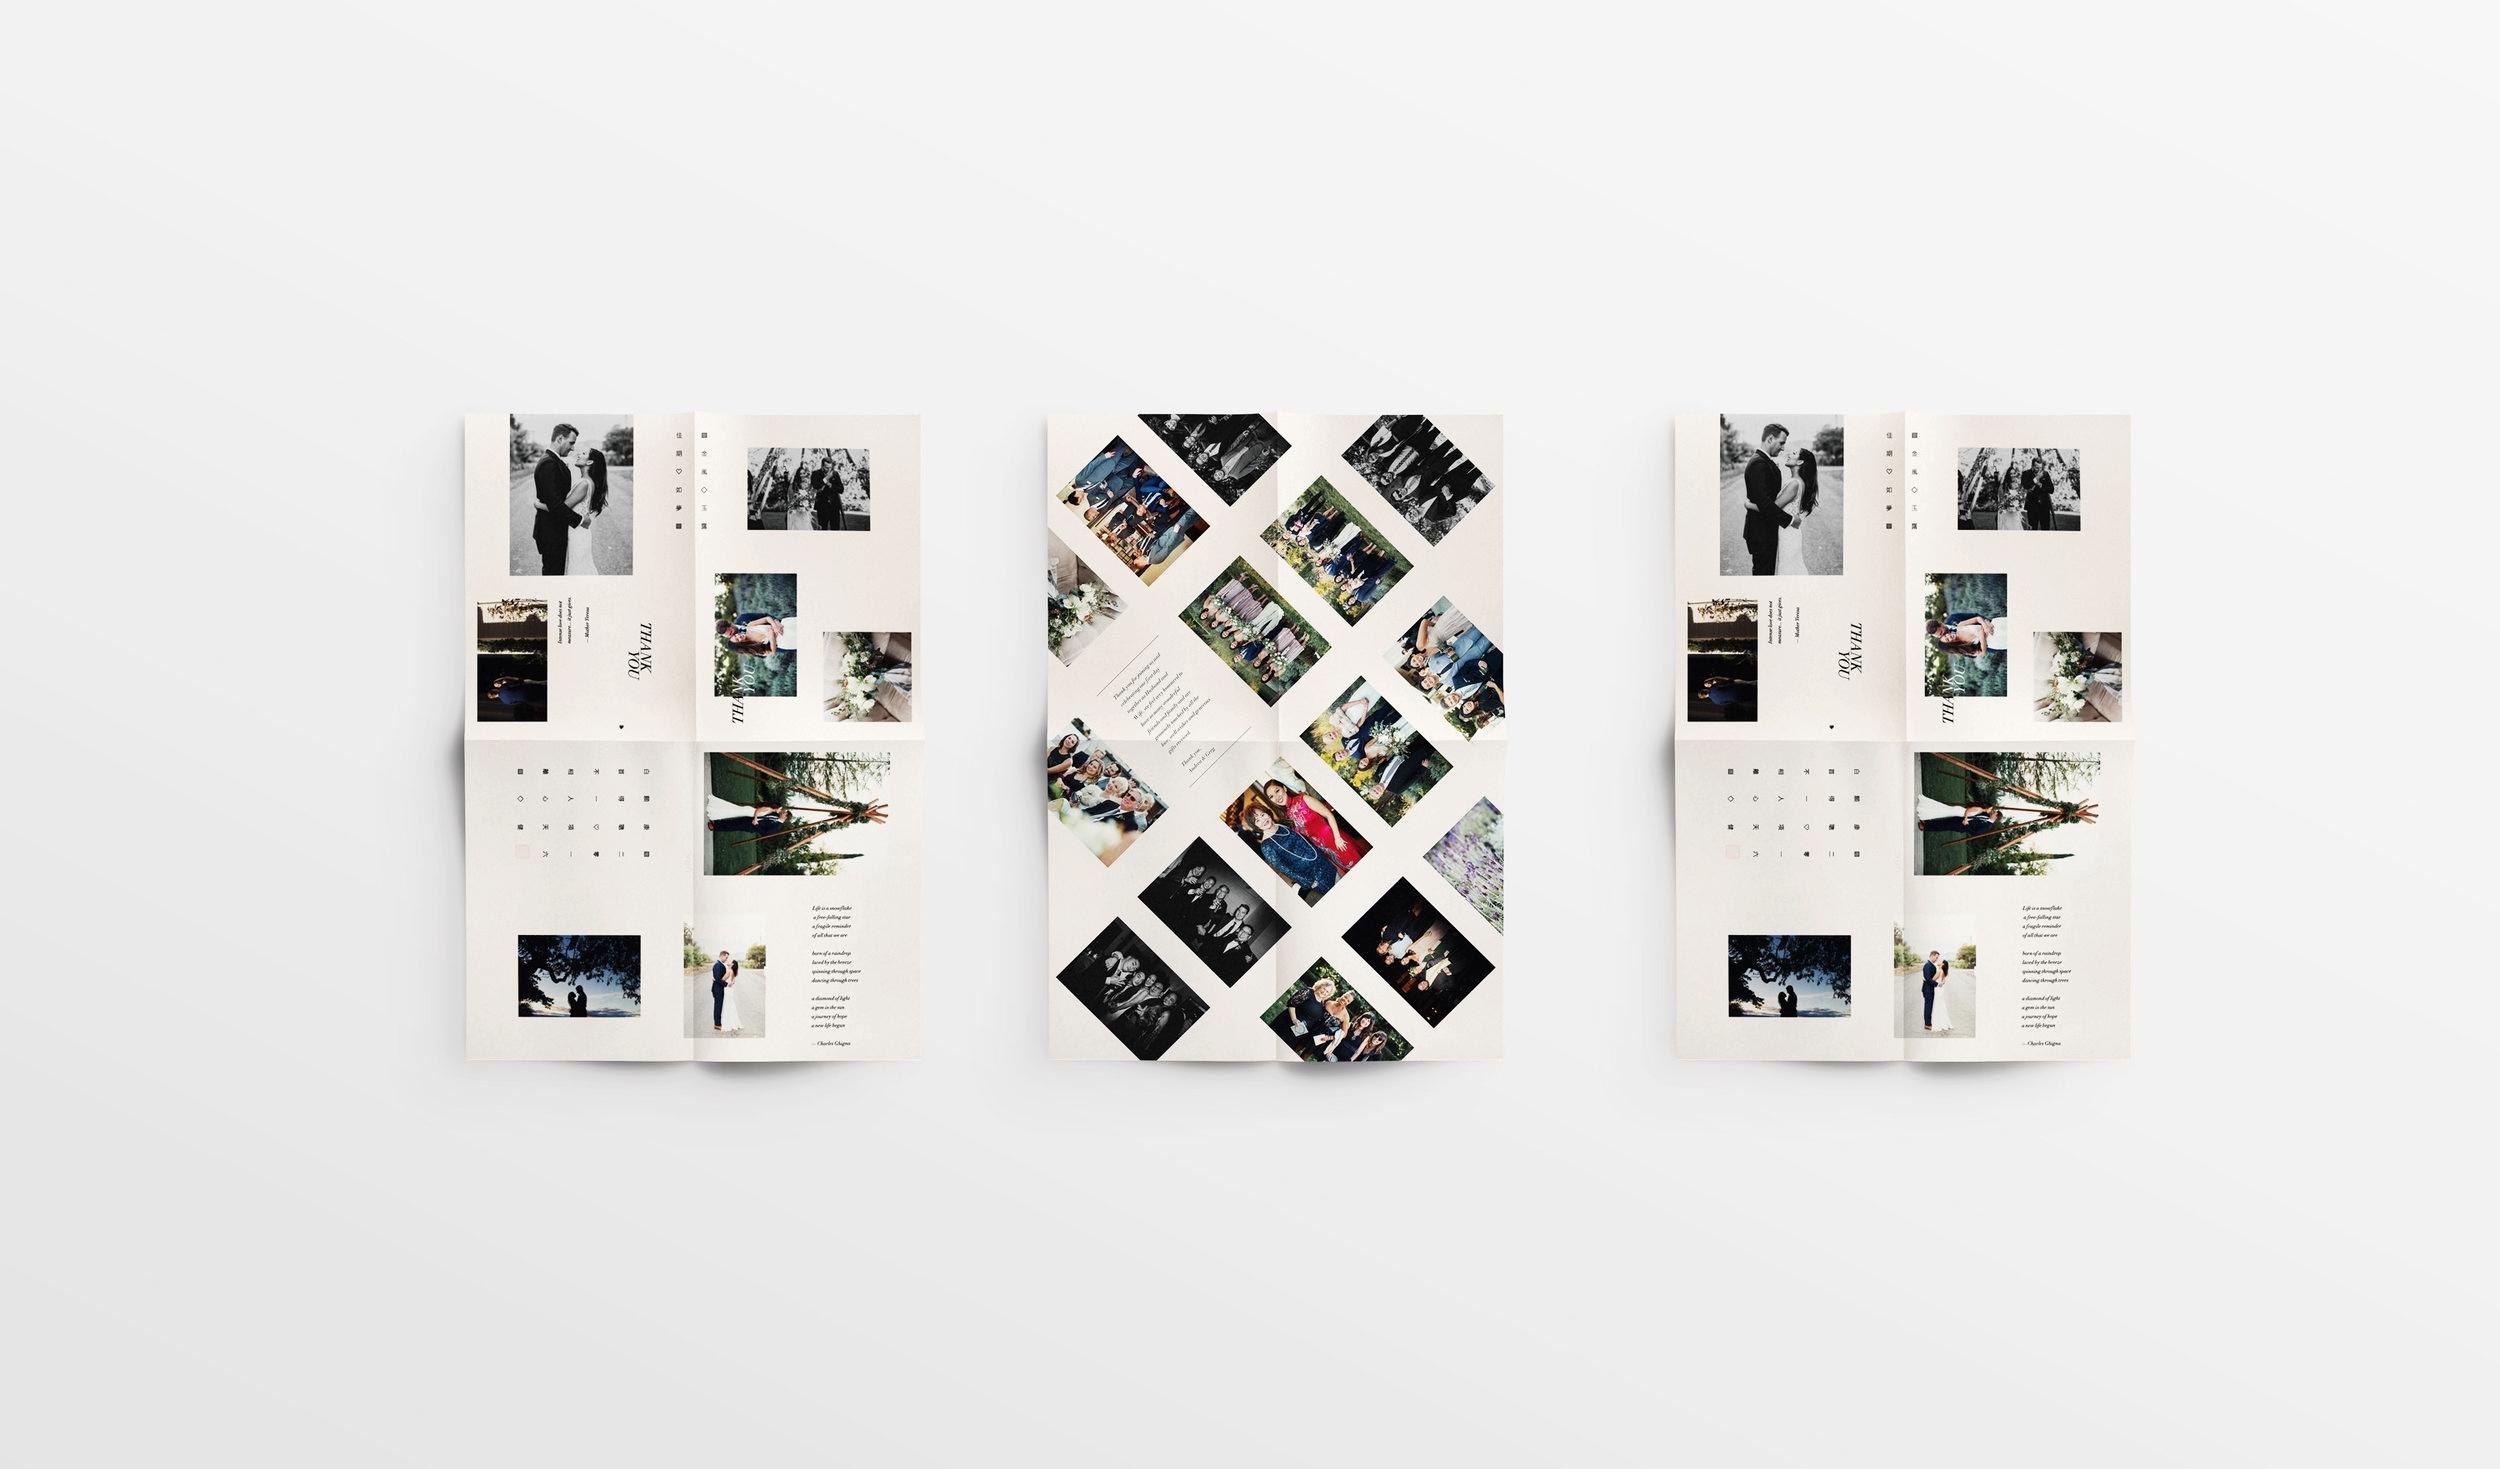 brigitkhstudio-print-thank-you-card-2.jpg